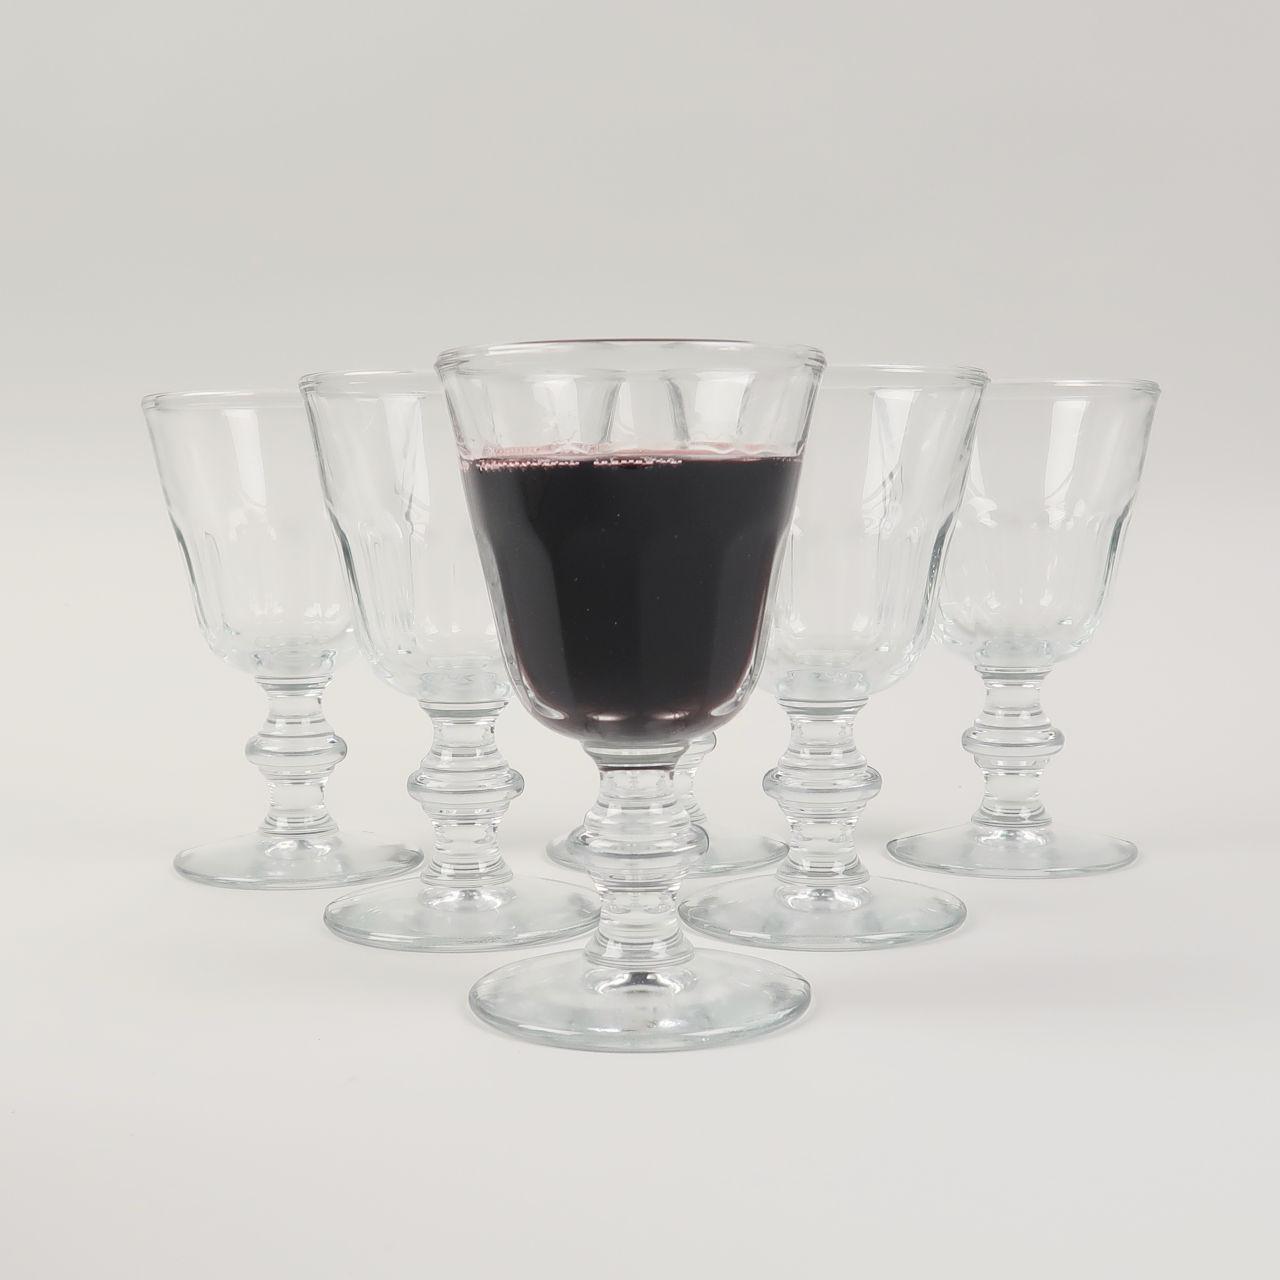 Perigord Large Wine Glass - Box of 6